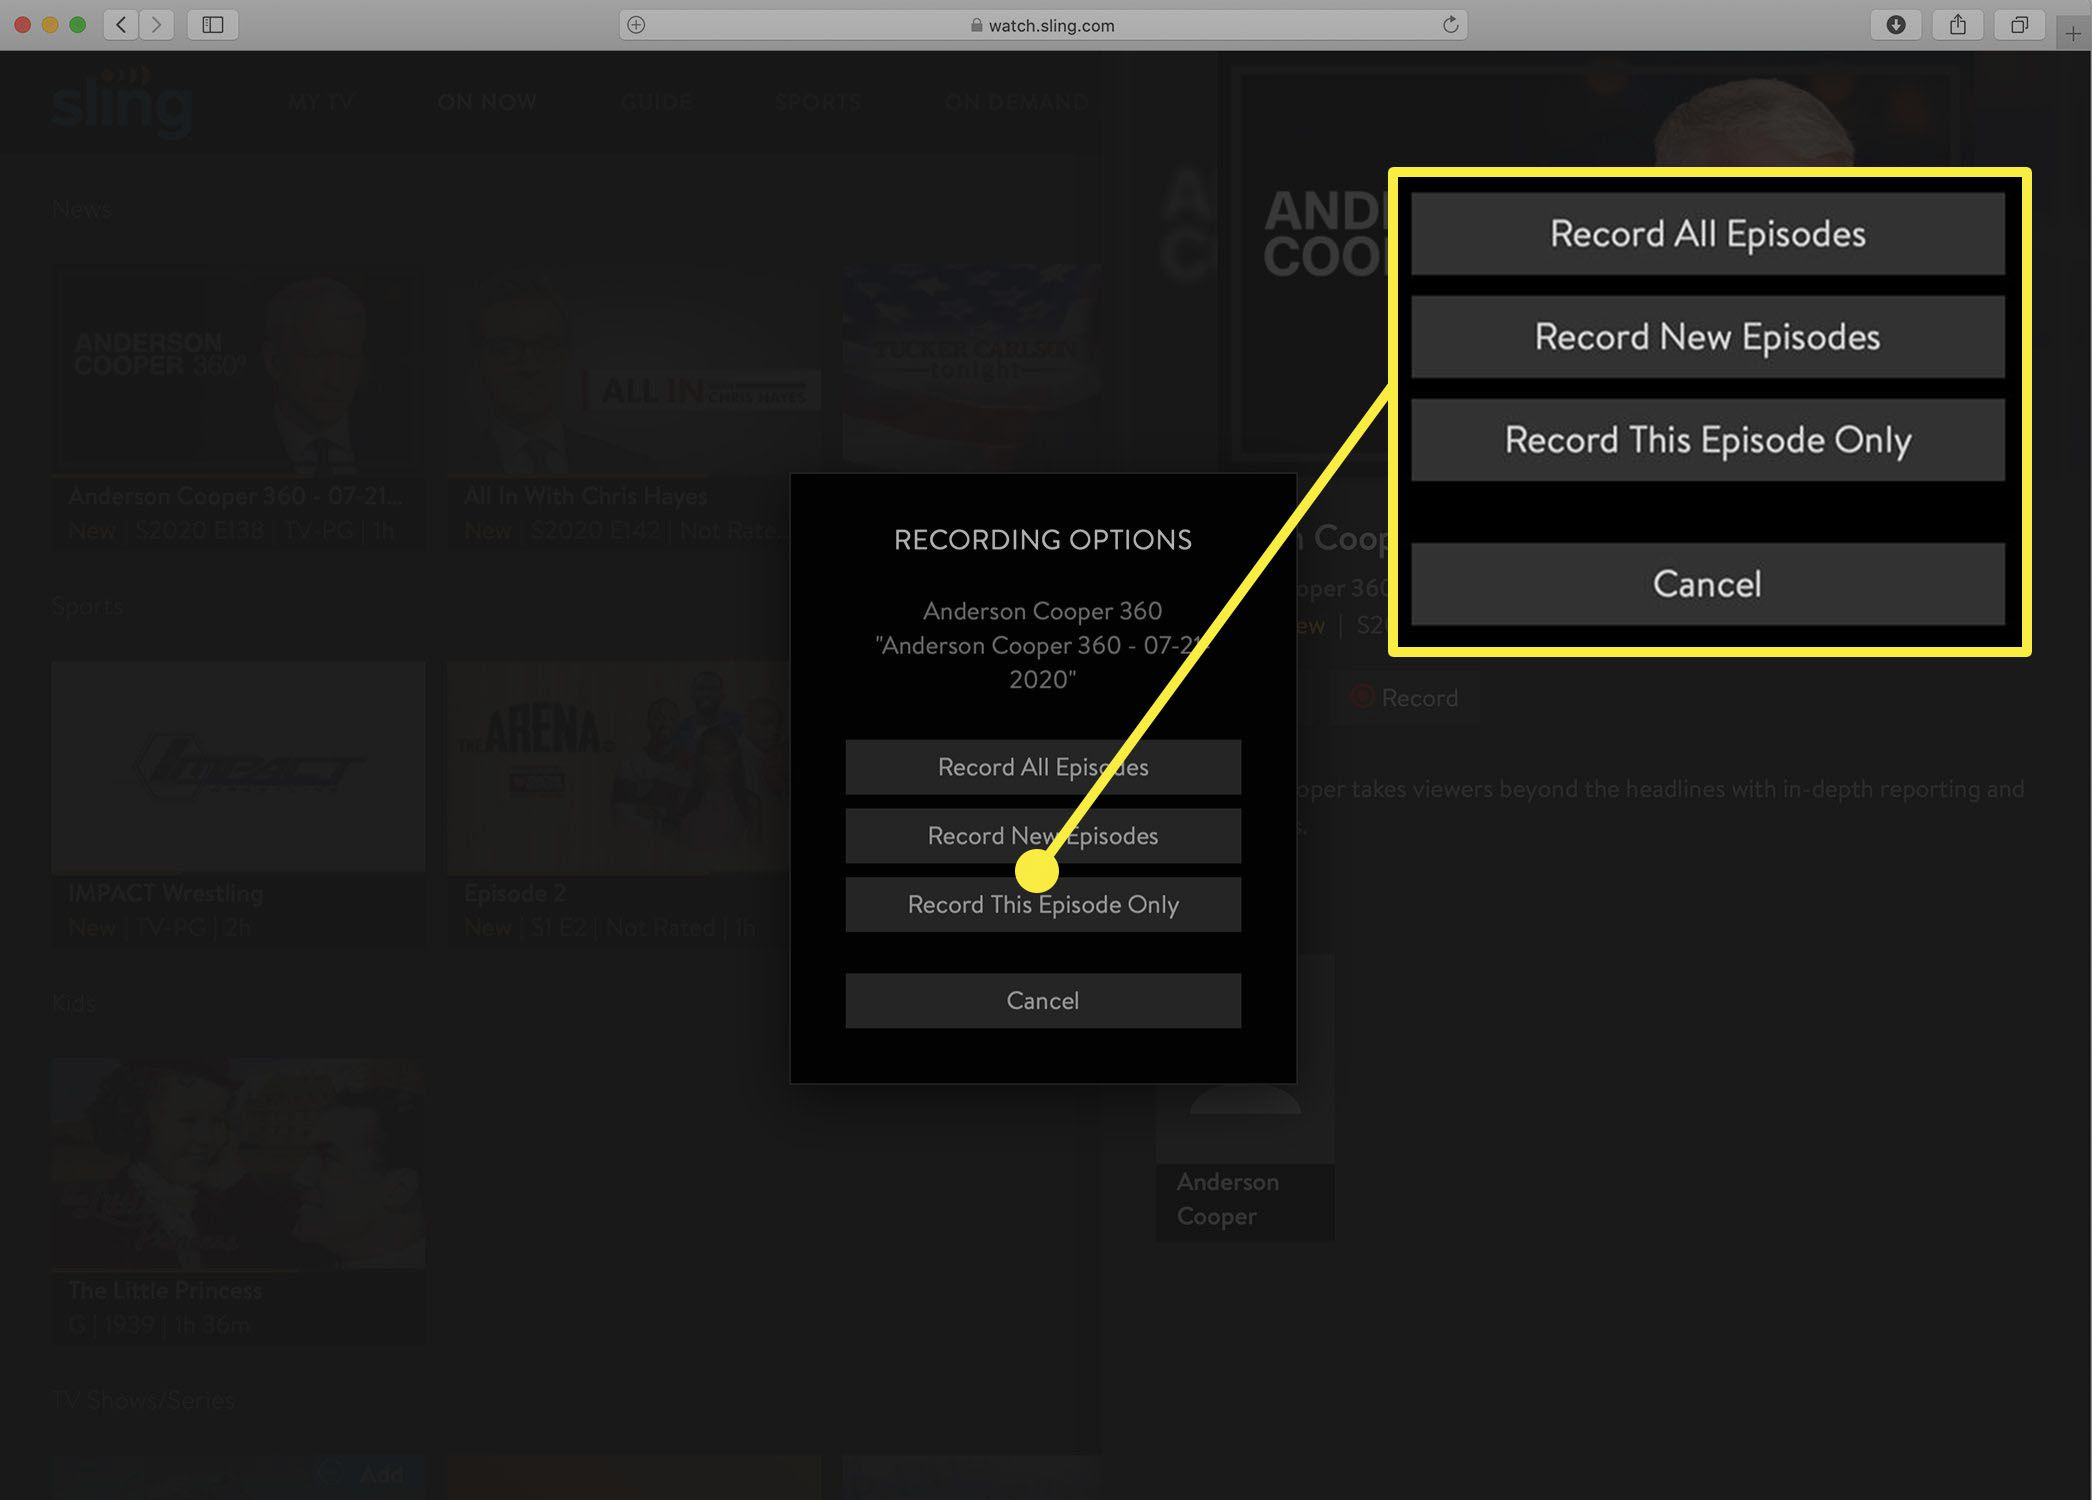 Screenshot of the Sling TV DVR recording options.